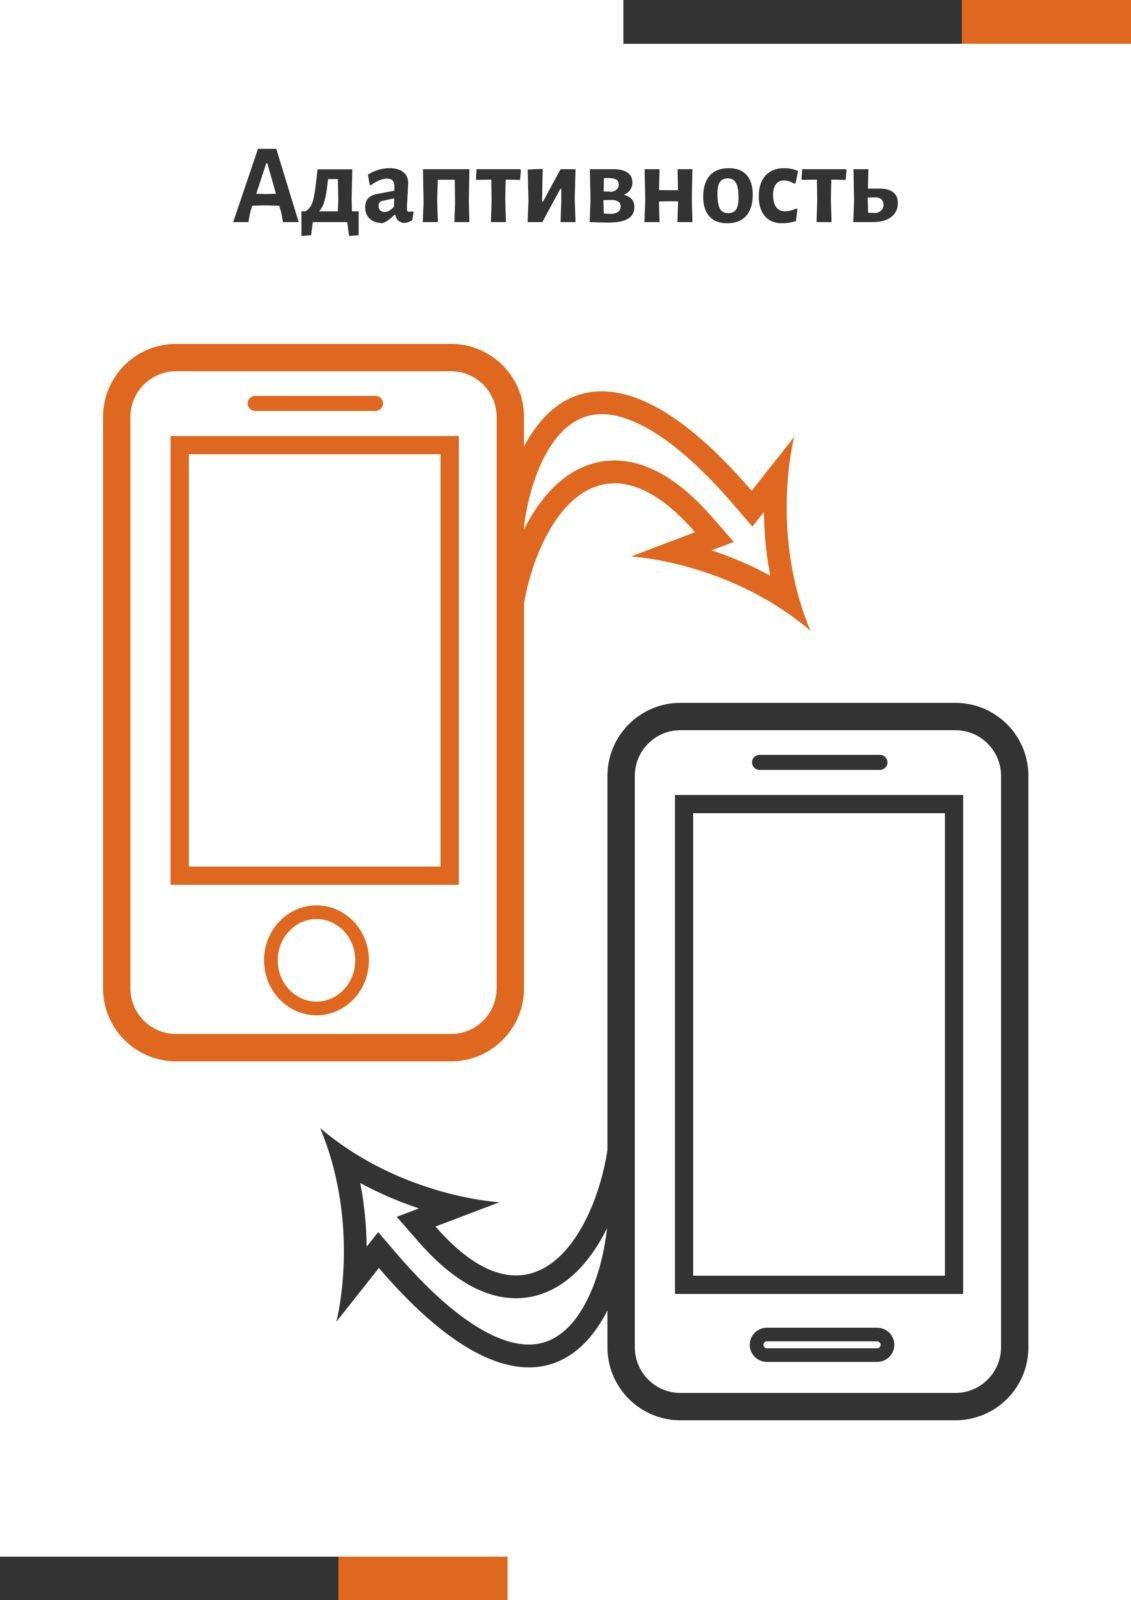 adaptivnost - Интернет-реклама в Нур-Султане (Астане)